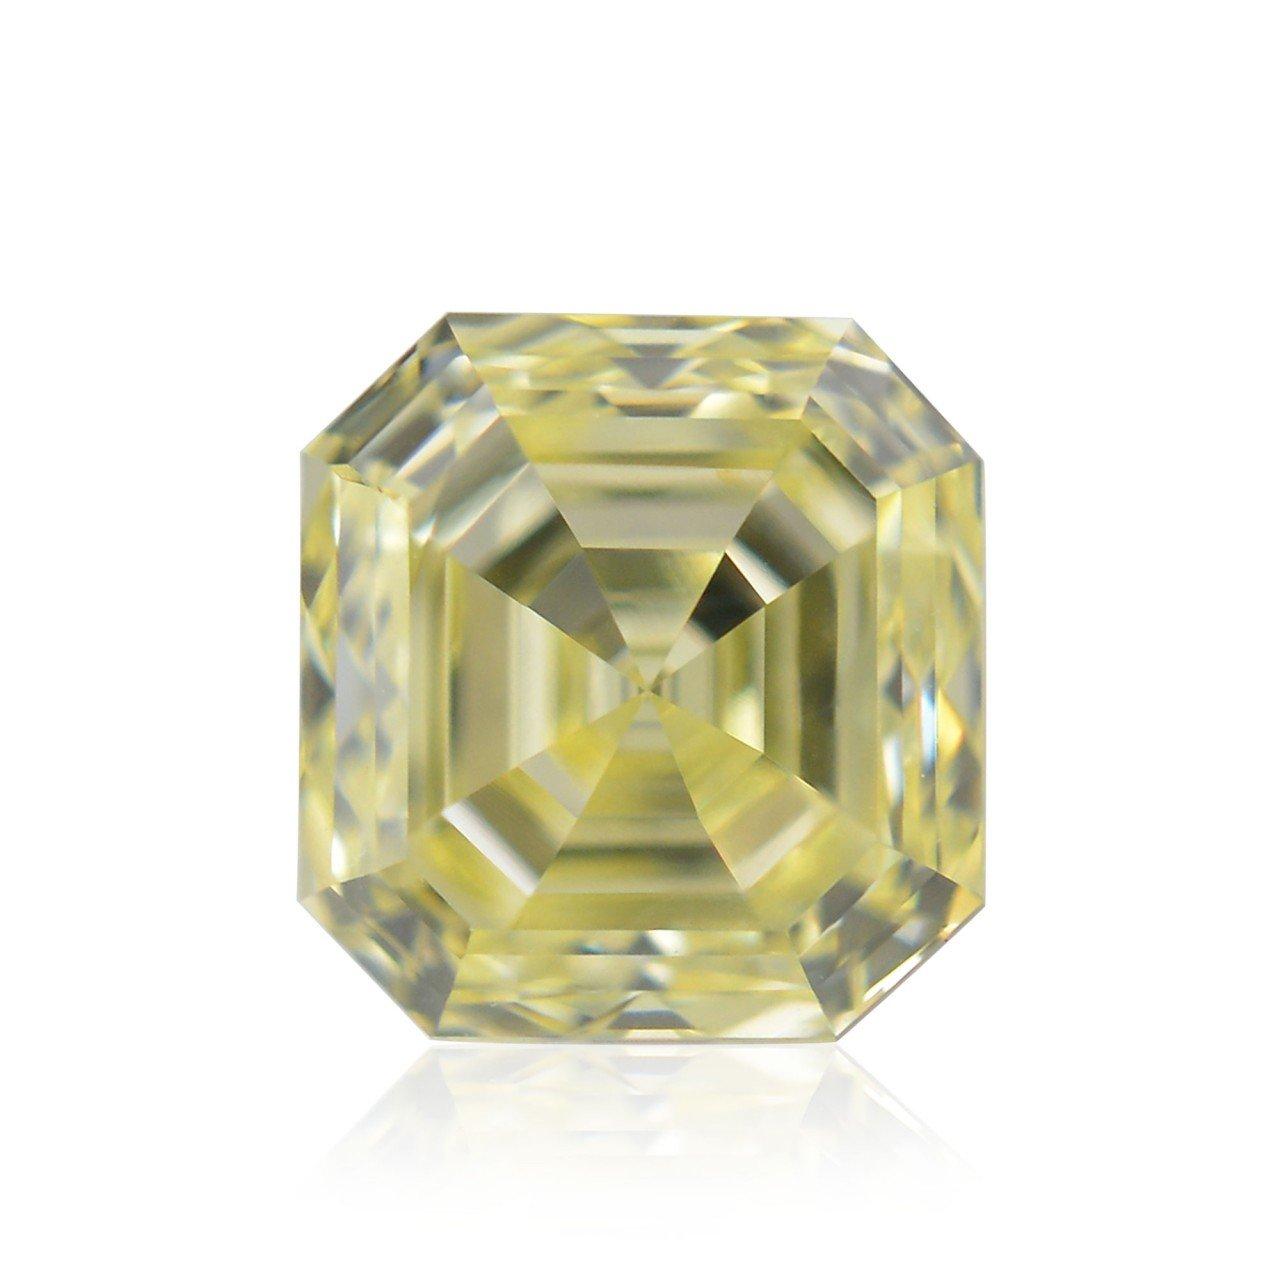 0.62Cts Fancy Yellow Loose Diamond Natural Color Emerald Cut IGI Certificate